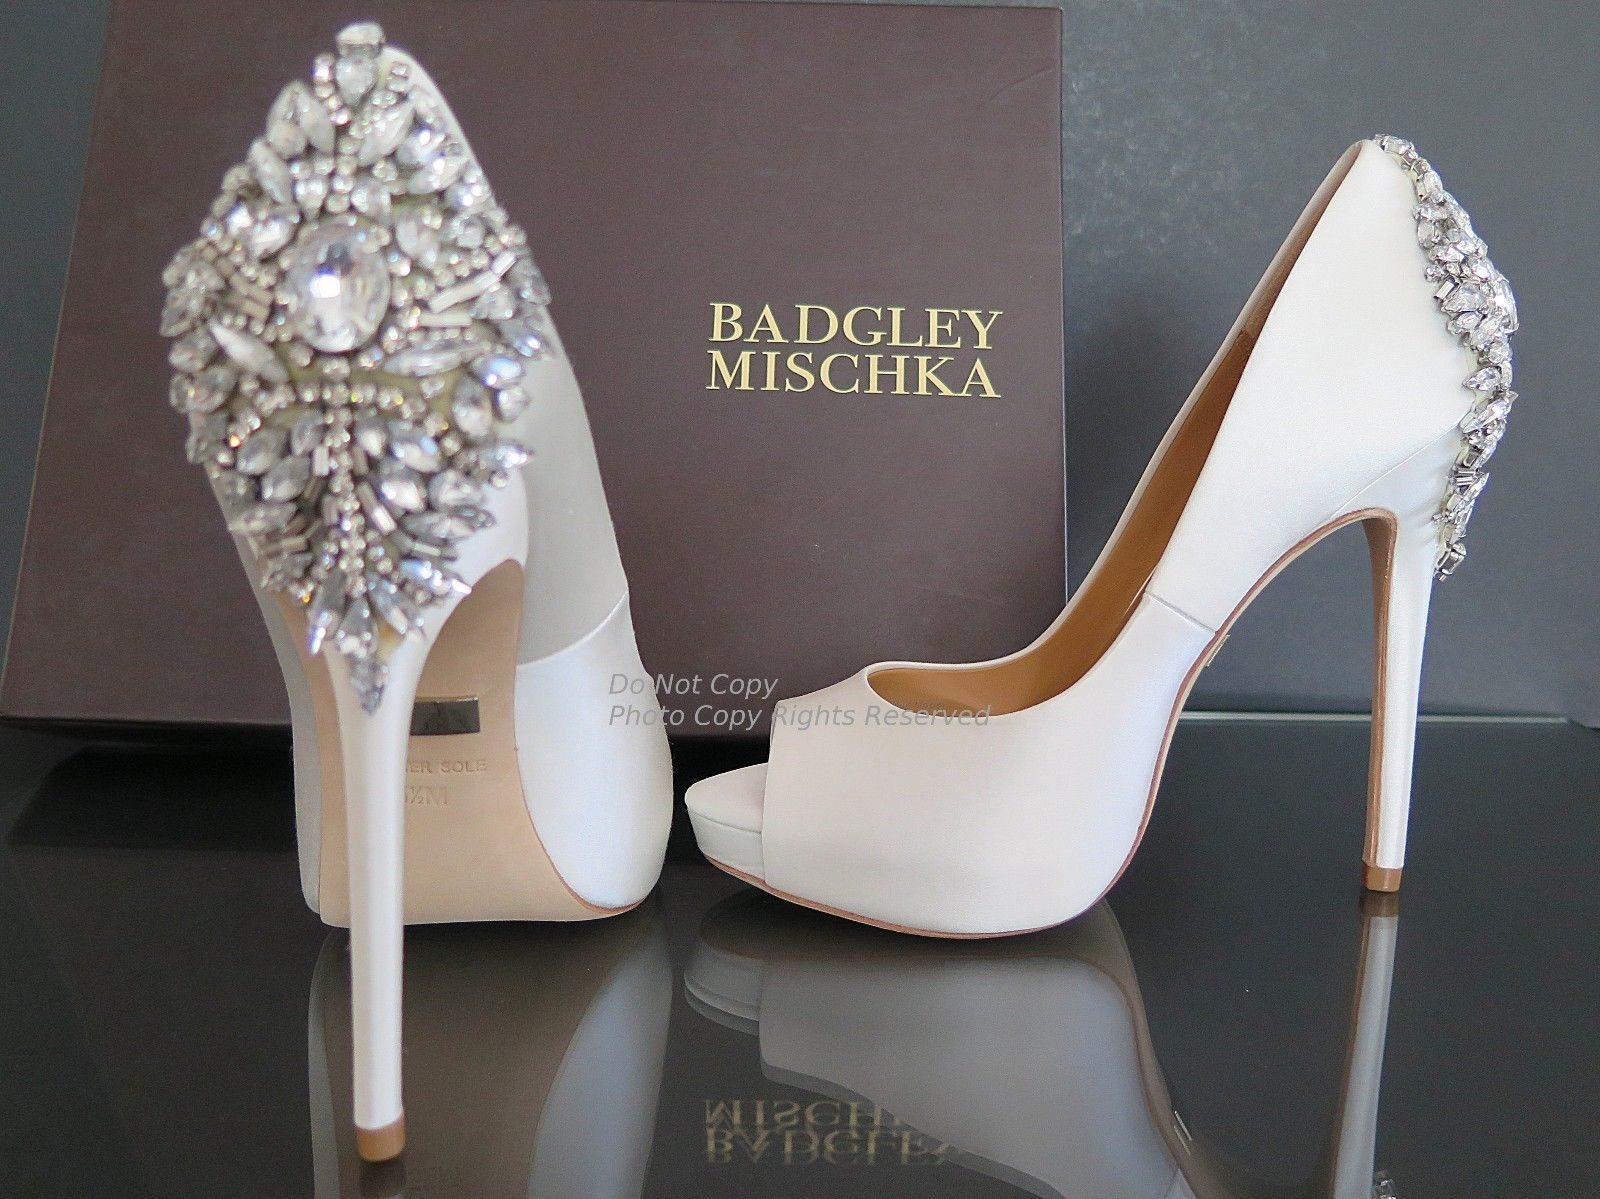 52d41e4ab760 BADGLEY MISCHKA Kiara Shoes White Satin Open Toe Pumps Crystal Back 5 1 2  Bridal